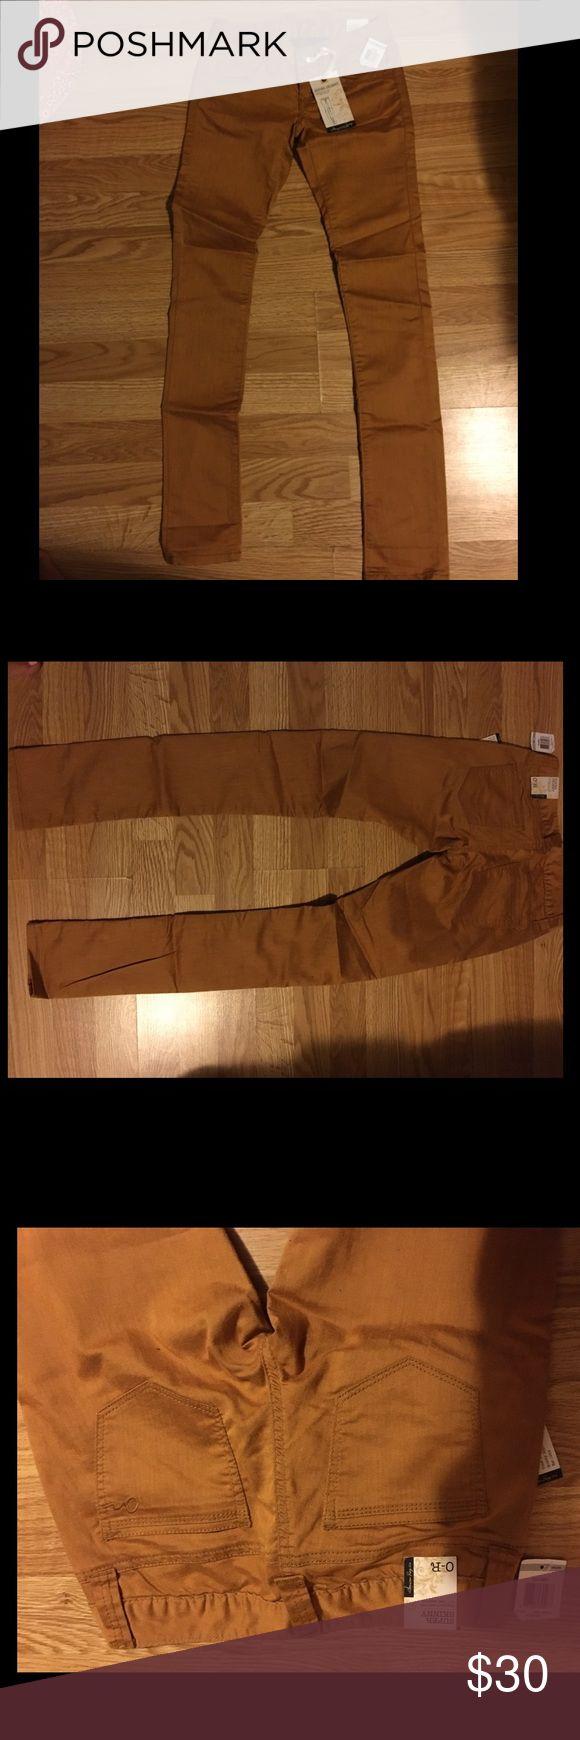 🆕 American rag jeans New American rag size 0R skinny jeans/pants, mustard color American Rag Jeans Skinny